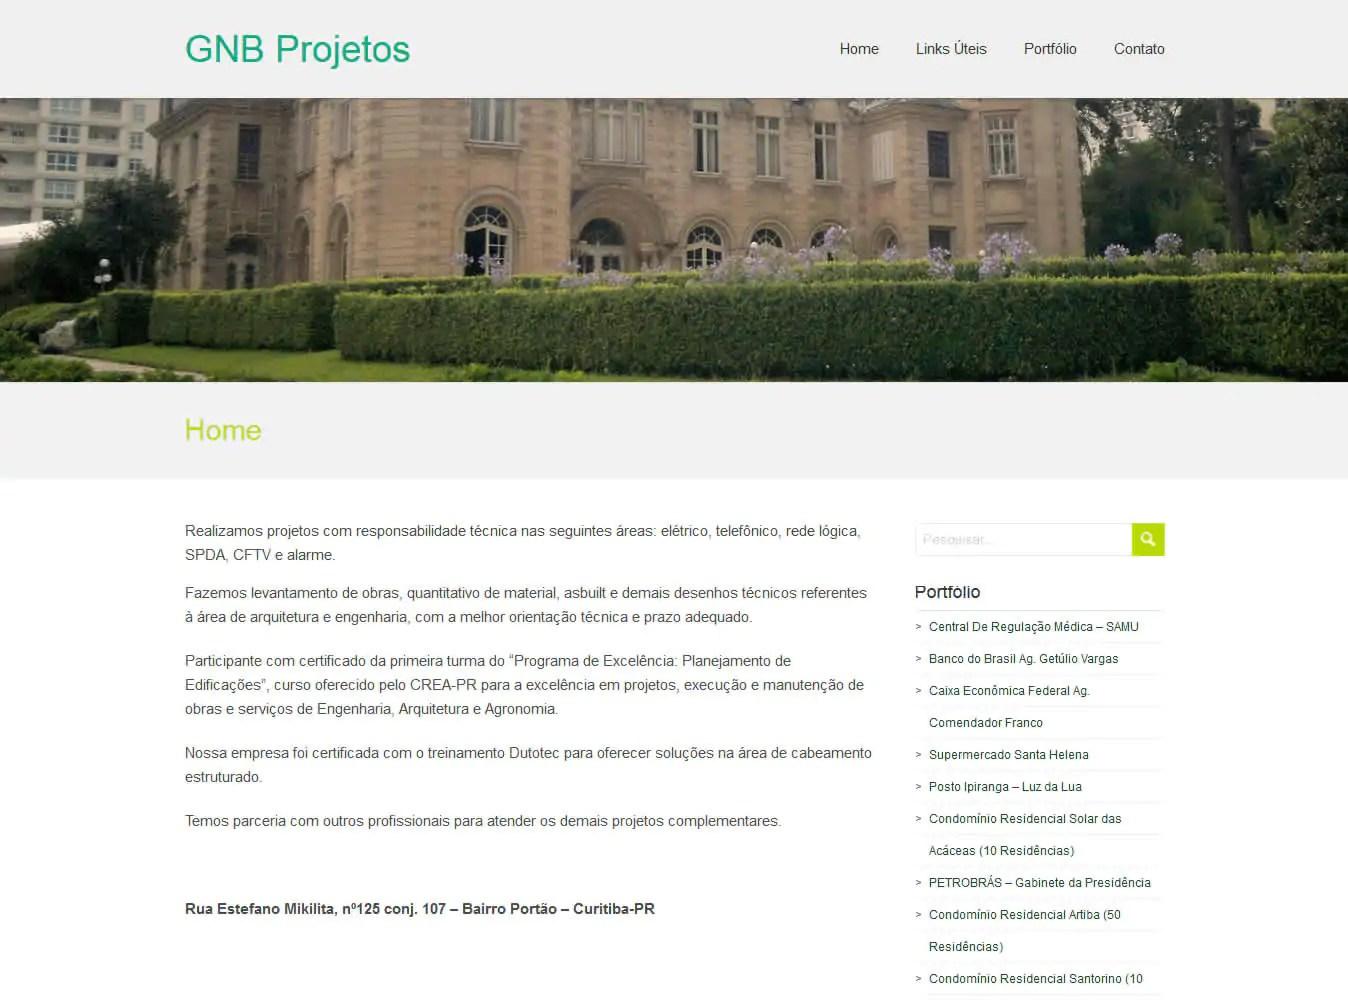 GNB Projetos